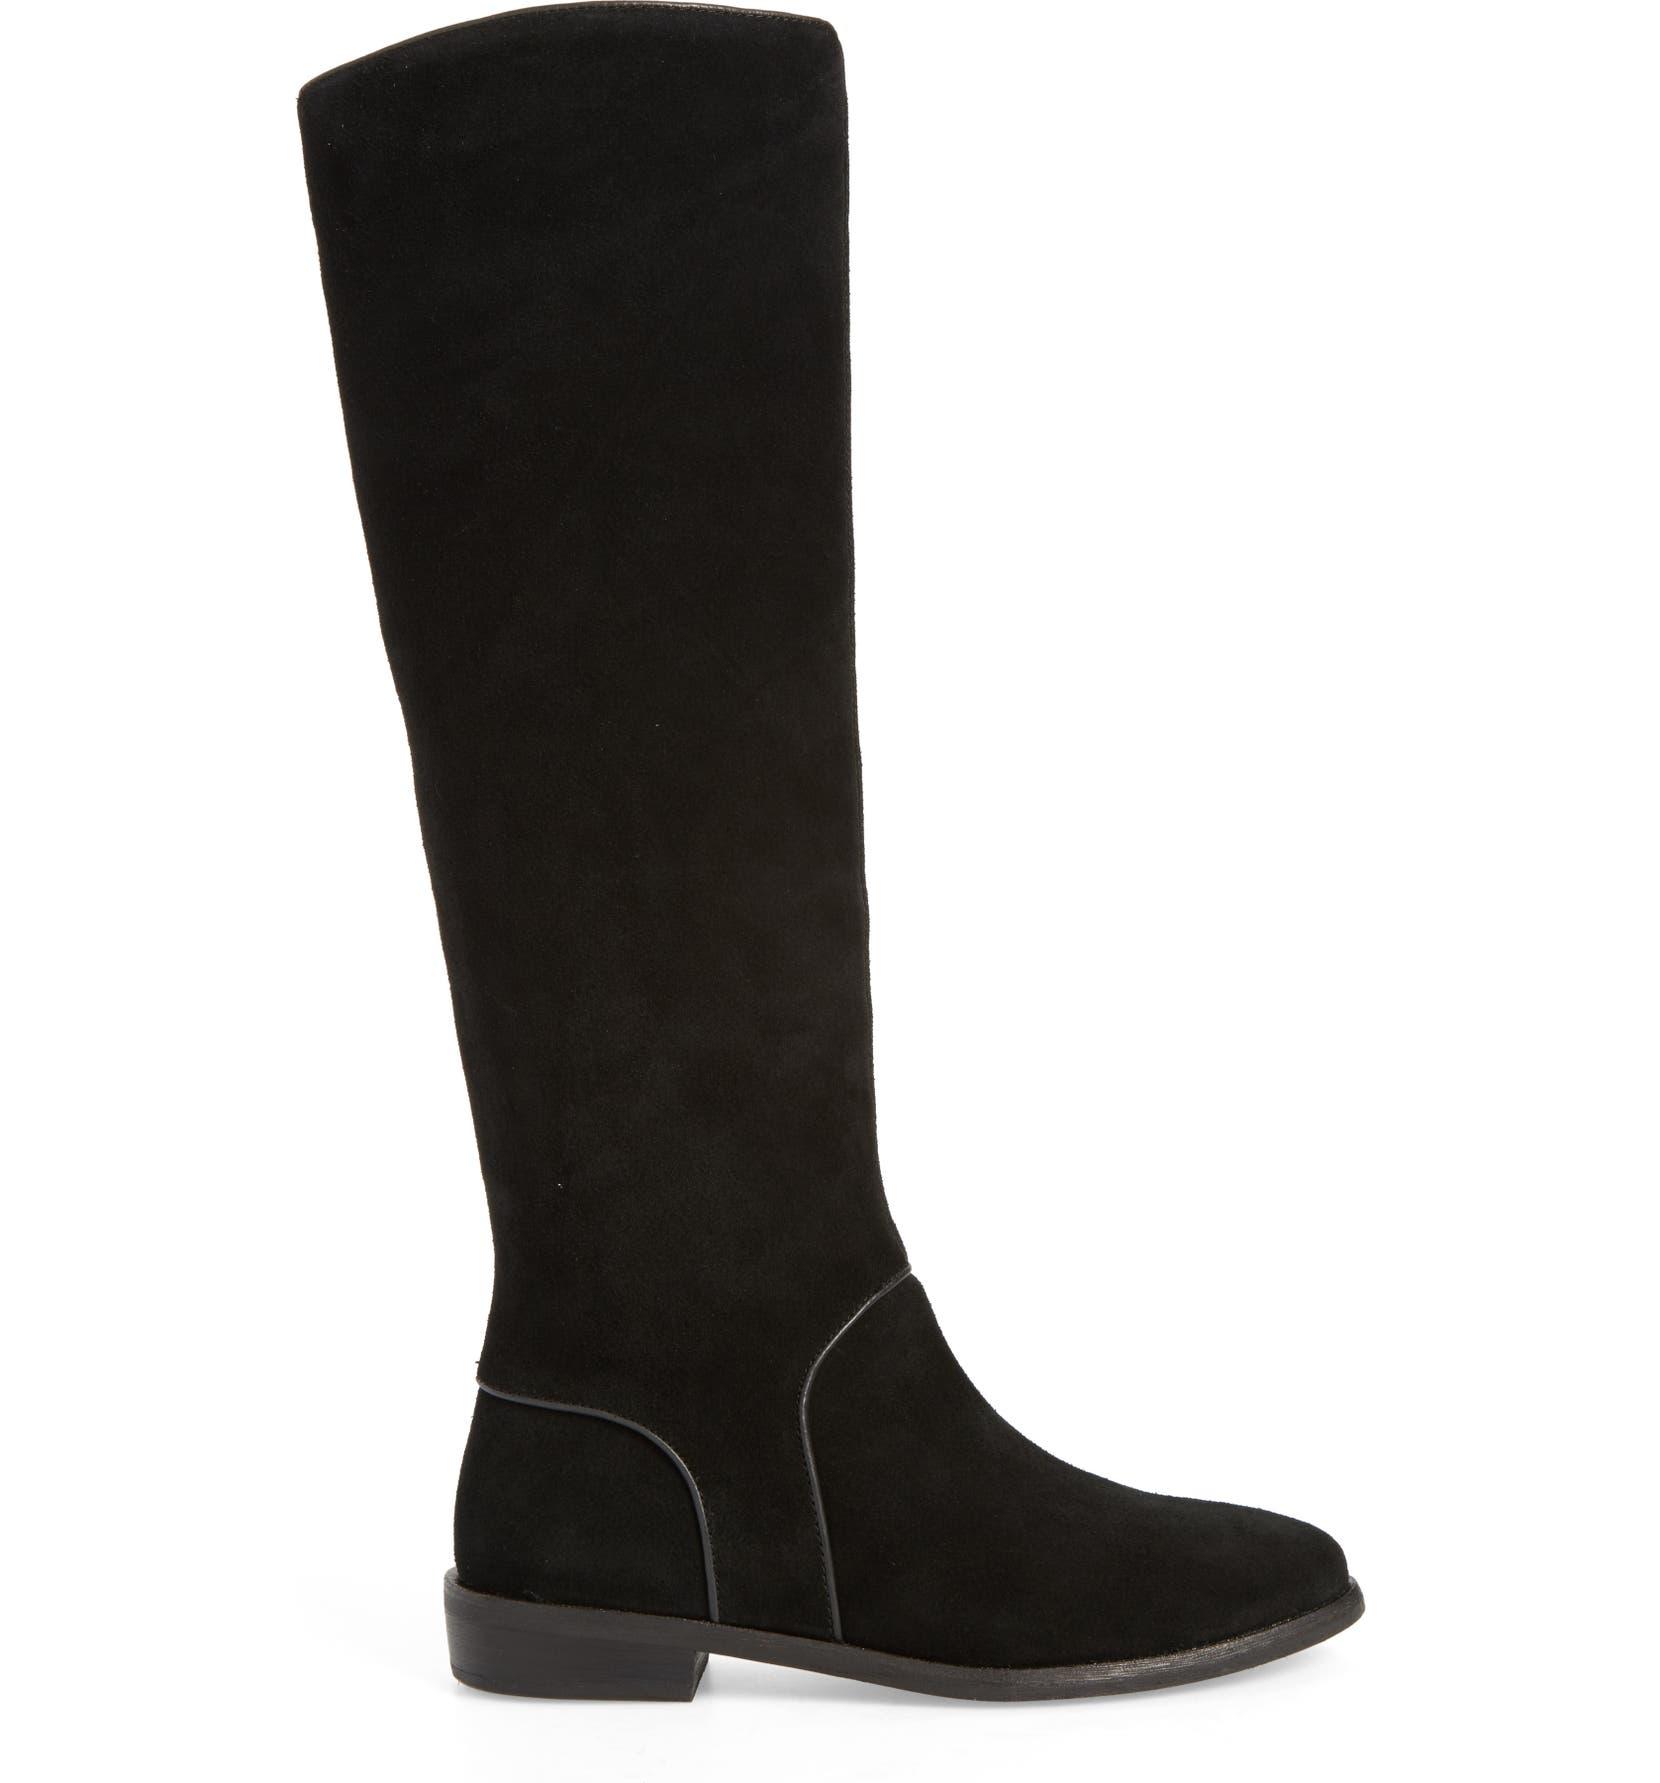 96230dbc3b9 Gracen Knee High Boot